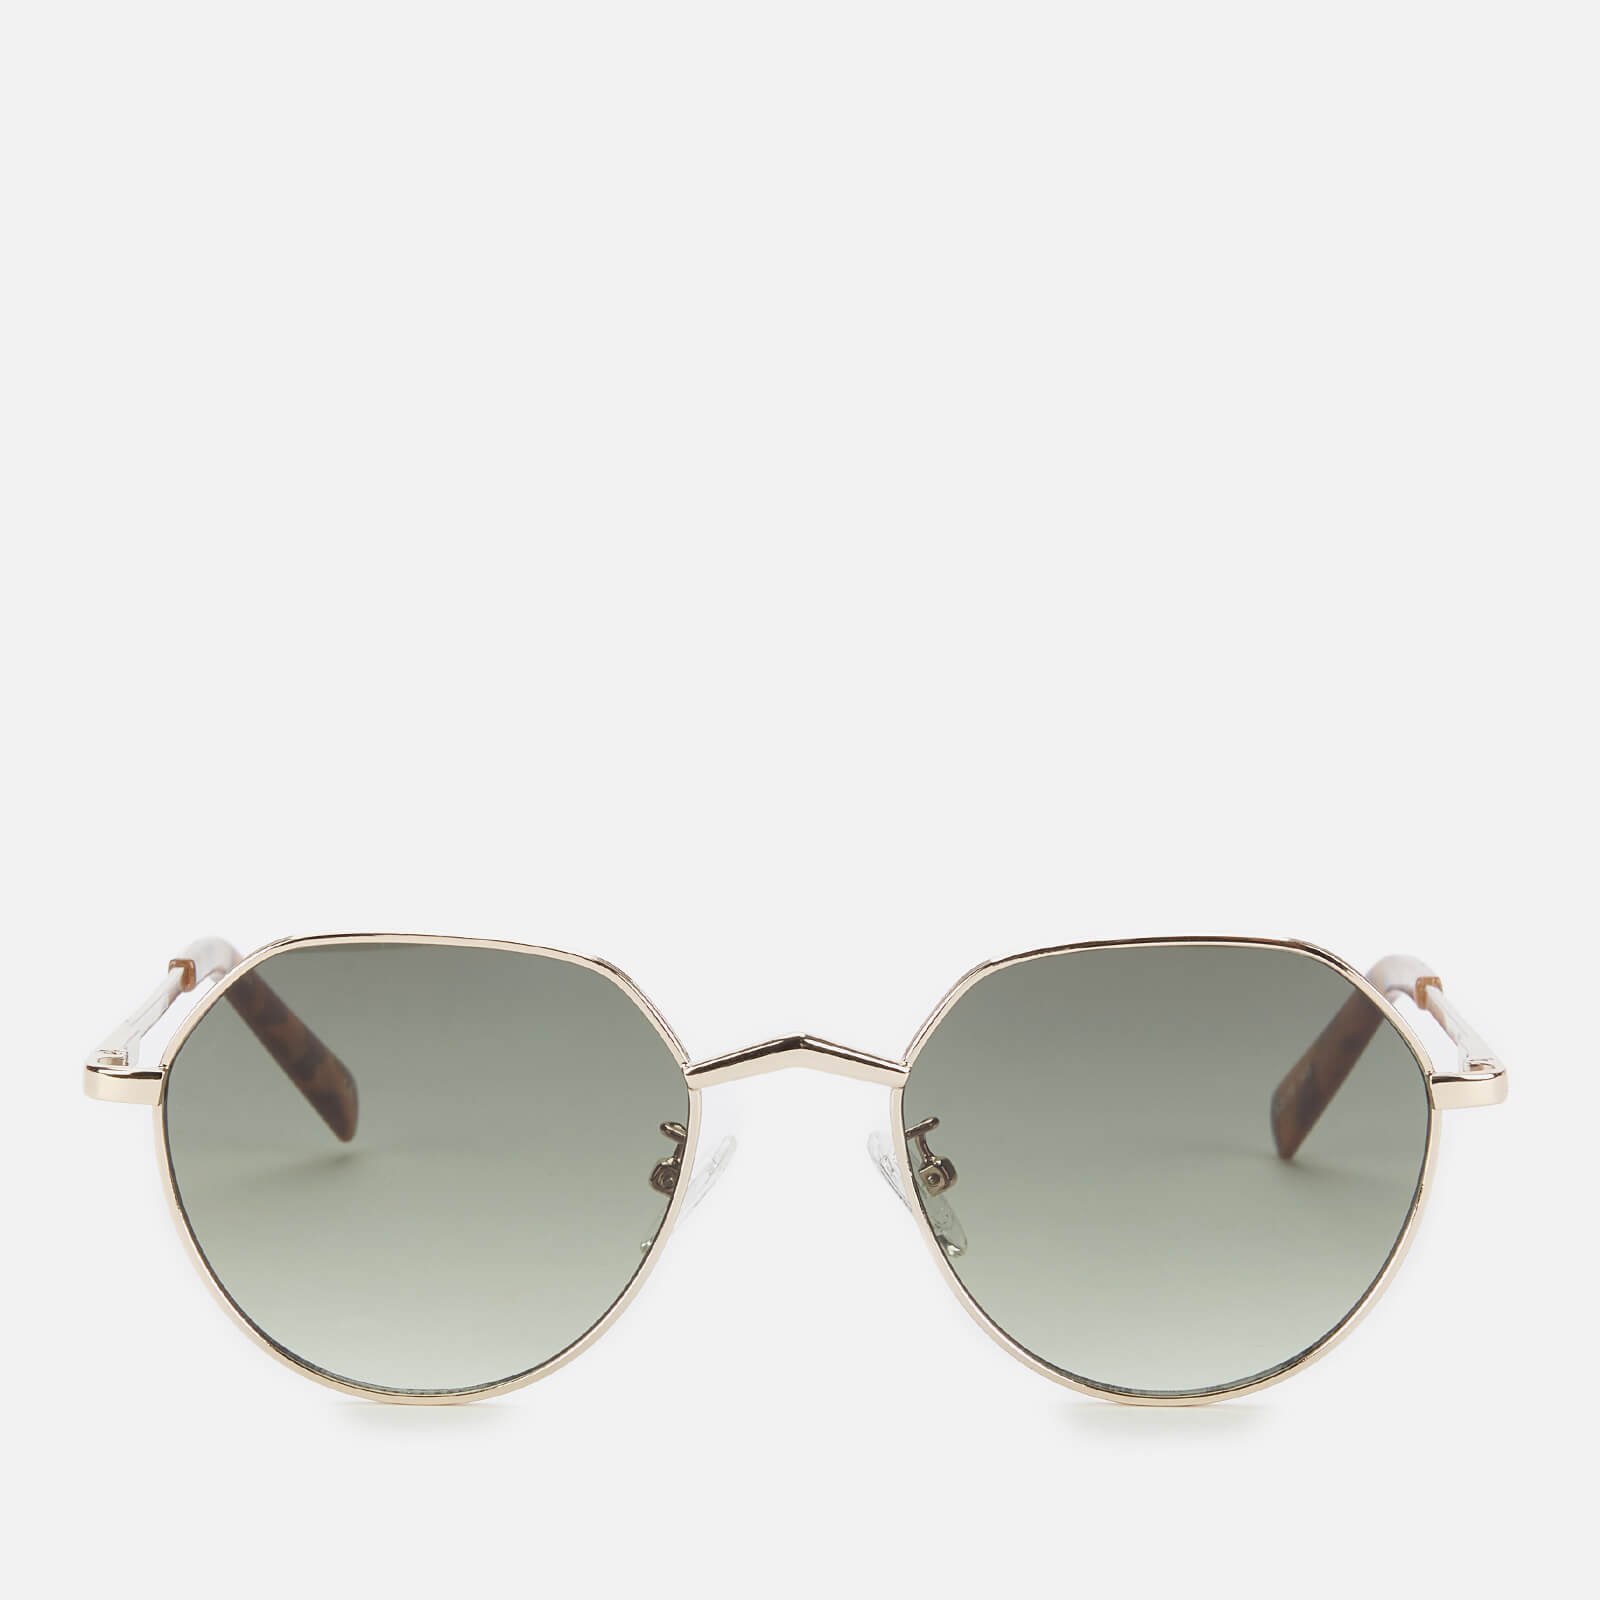 Le Specs Women's Newfangle Square Sunglasses - Gold